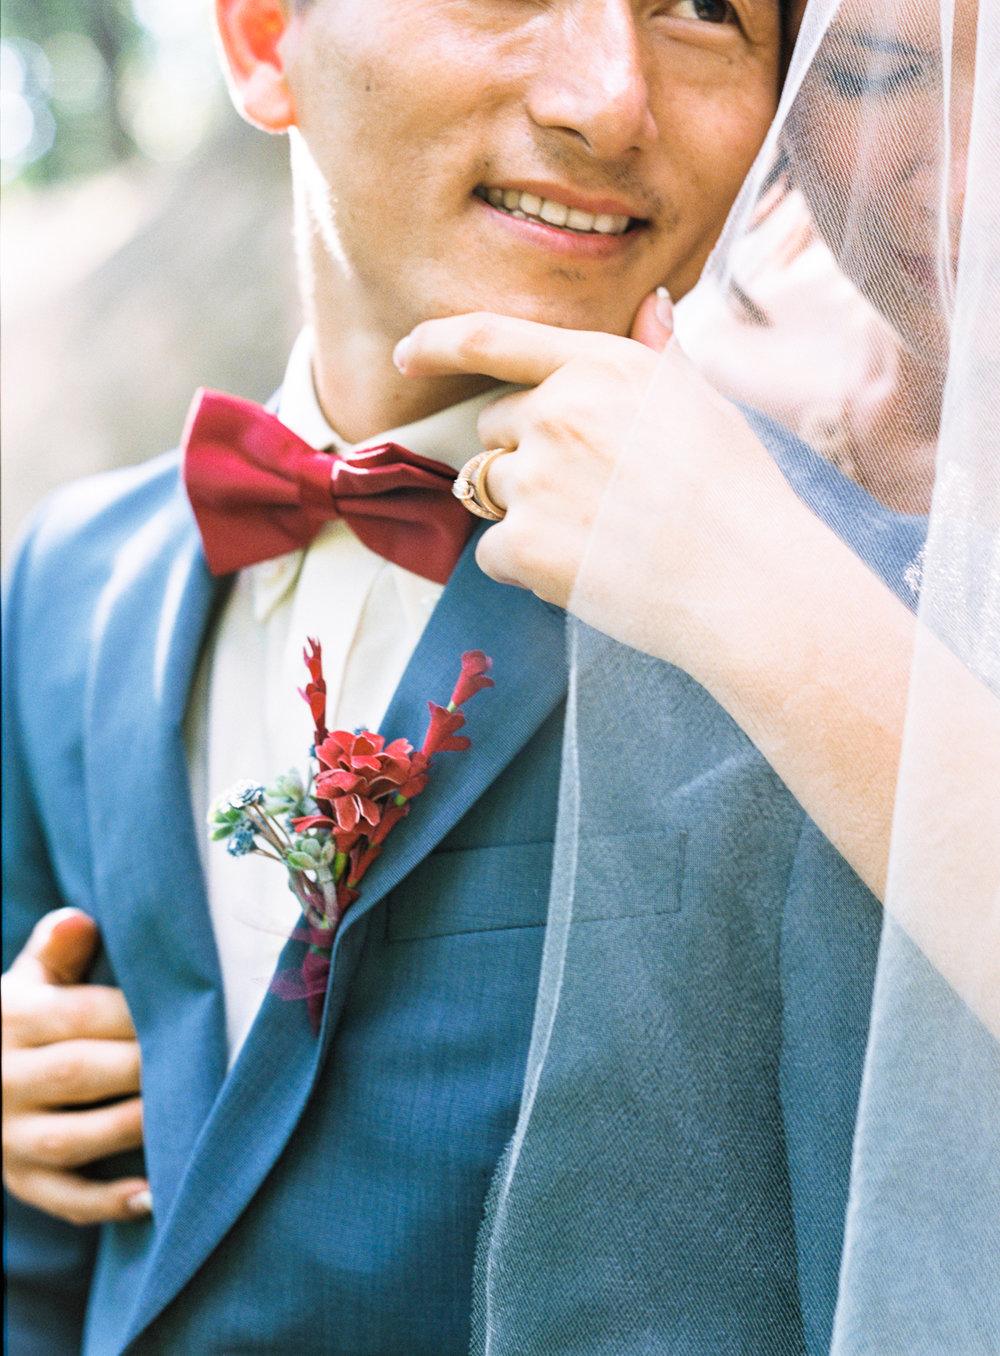 Leaf-&-Pine-Lindsey-Kaiphen-Wedding-19.jpg